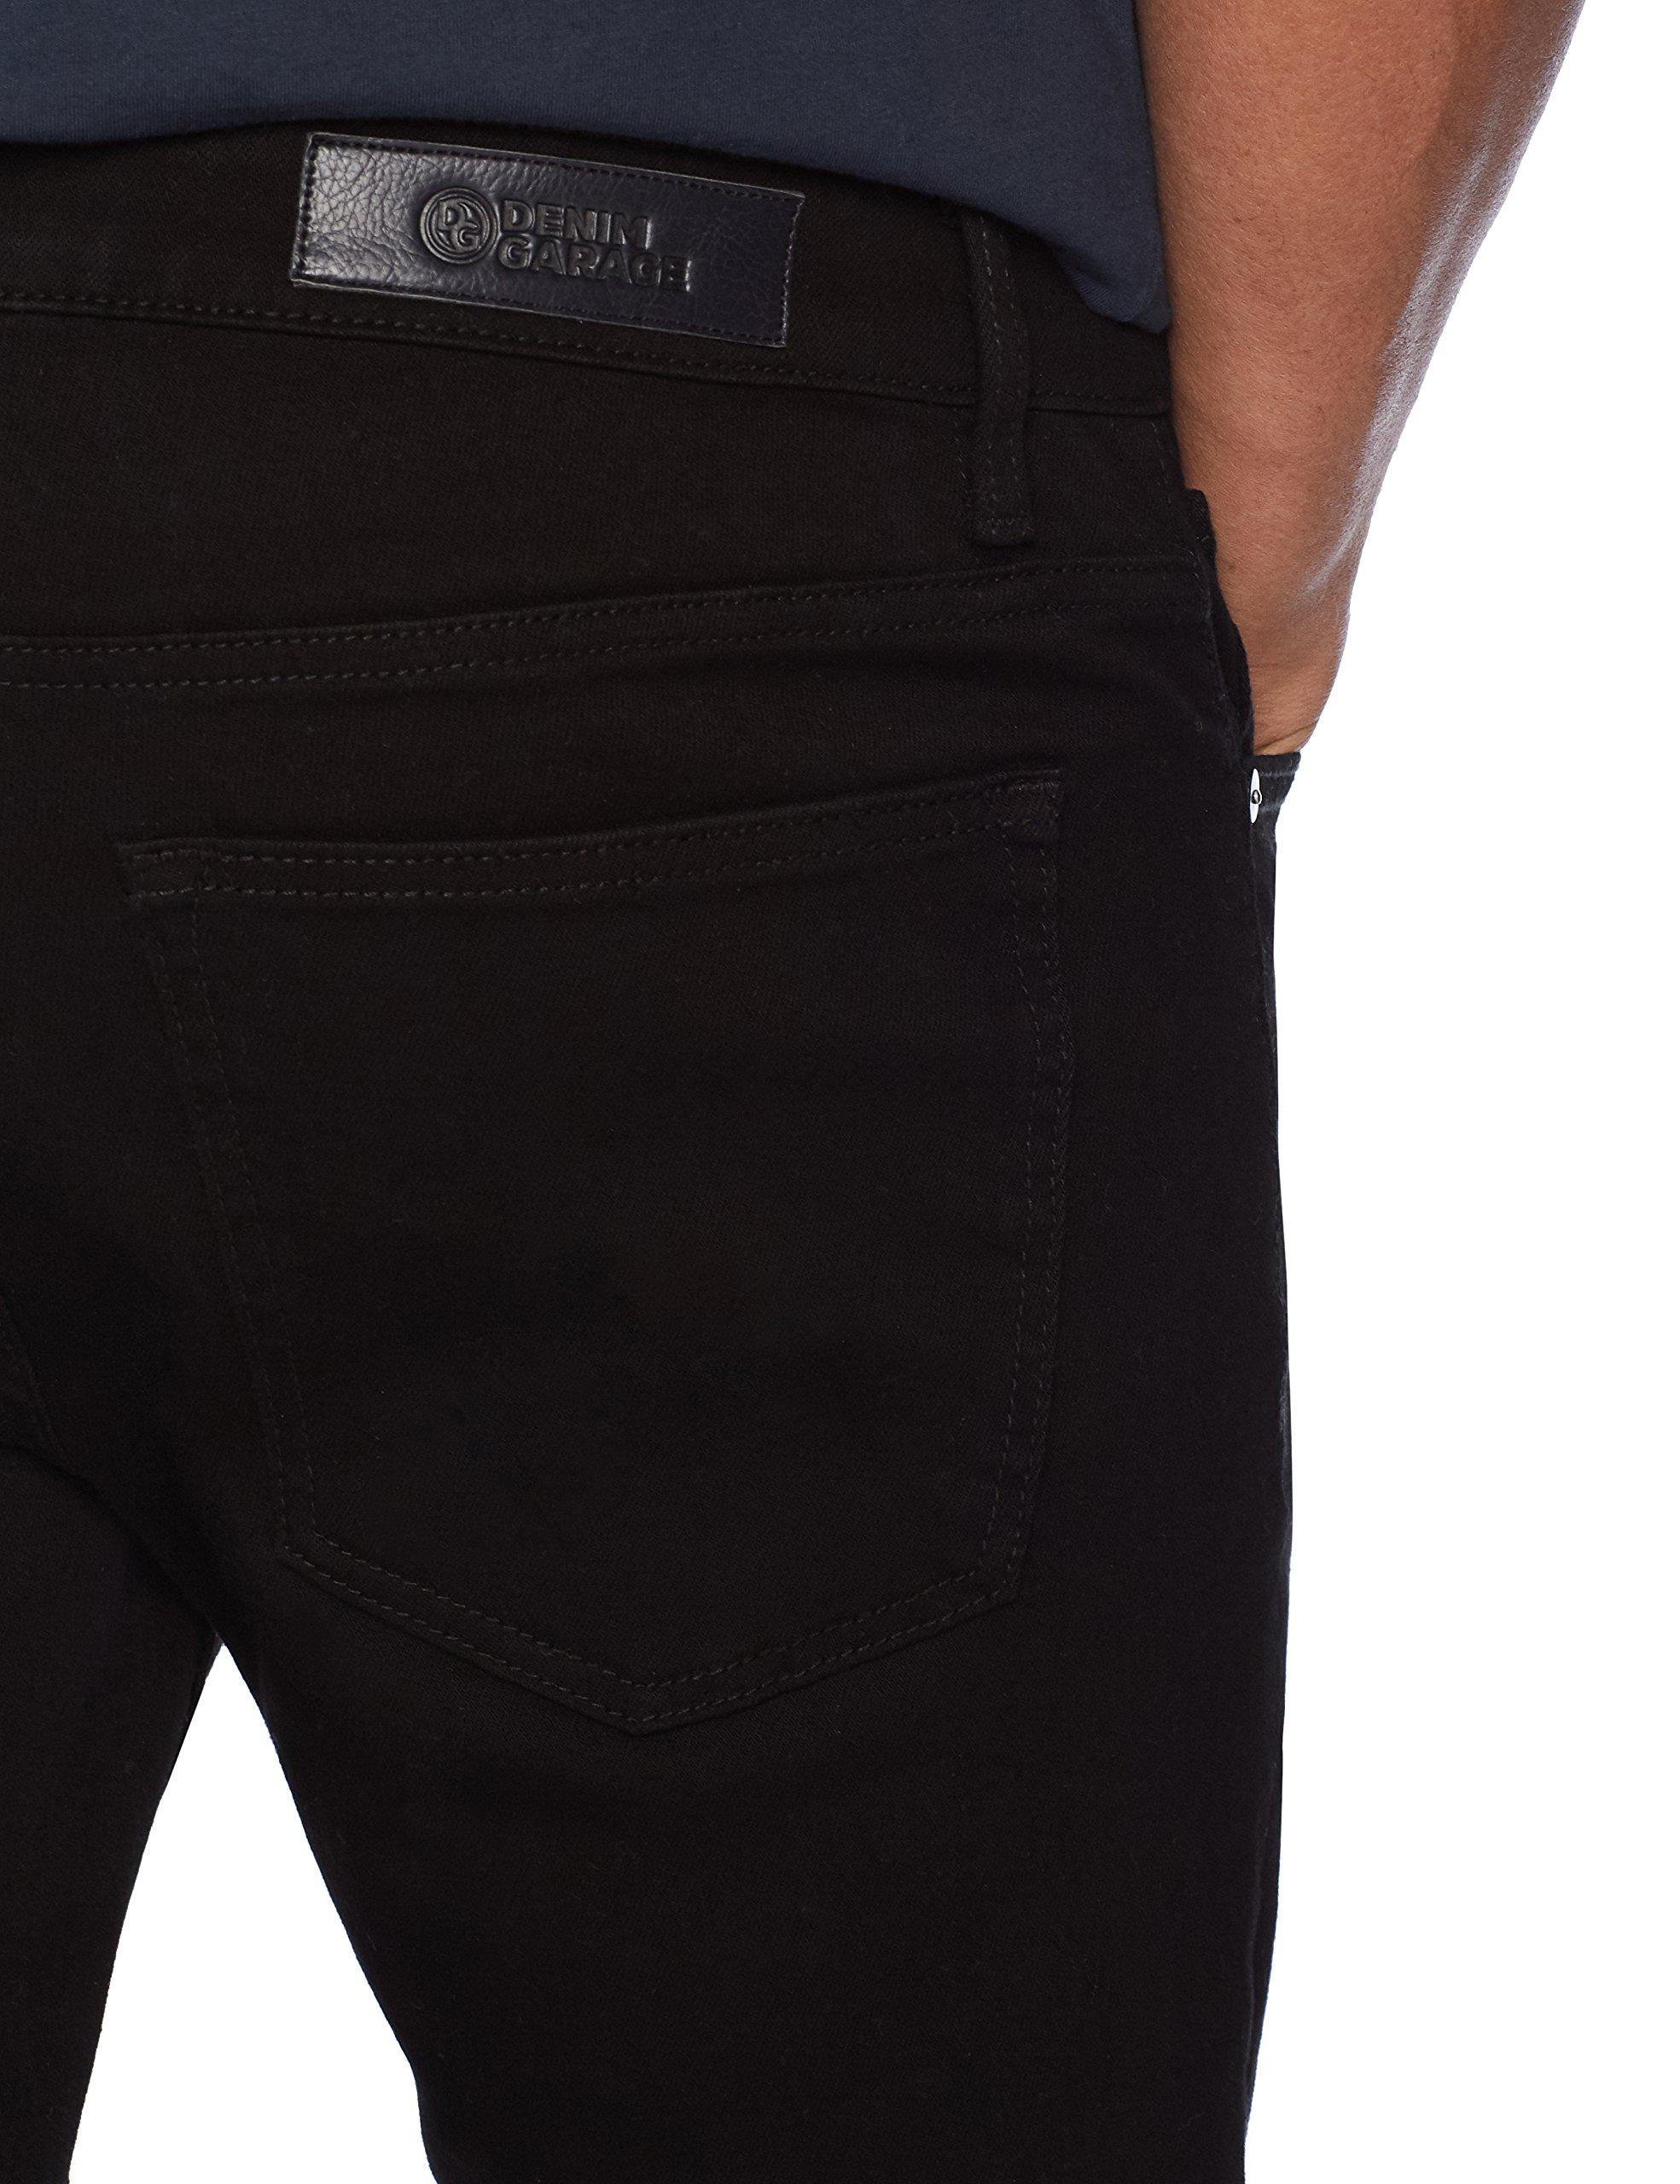 Denim Garage Classics Men's Skinny Stretch Jean 31X32 Black by Denim Garage Classics (Image #4)